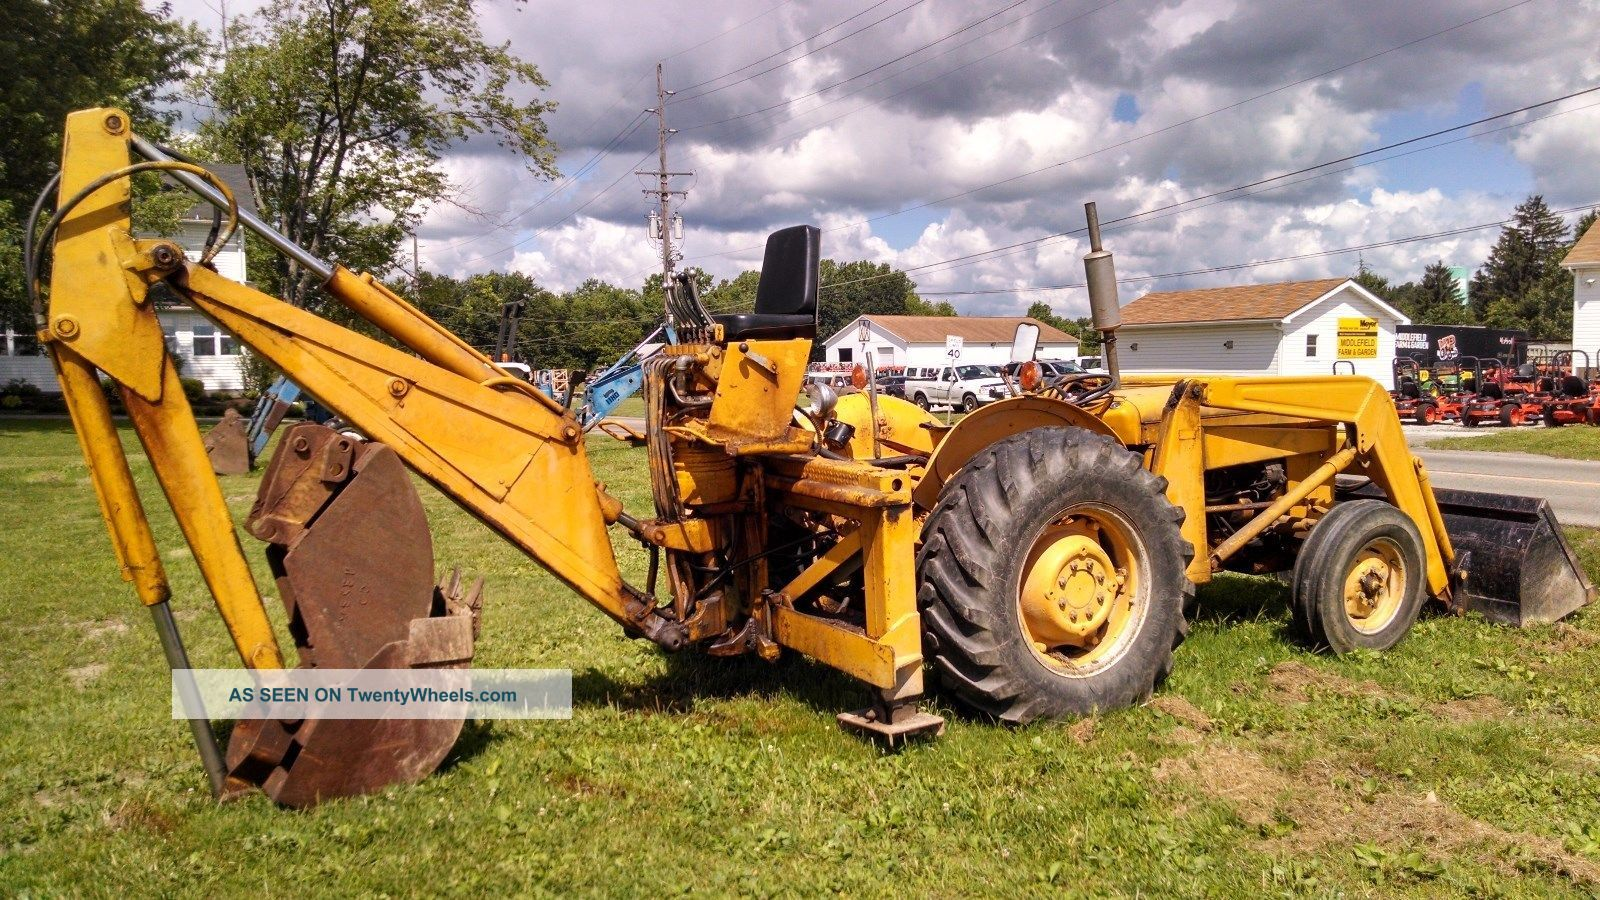 Massey Ferguson Tractor Loader Backhoe : Massey ferguson tractor loader backhoe point rear pto